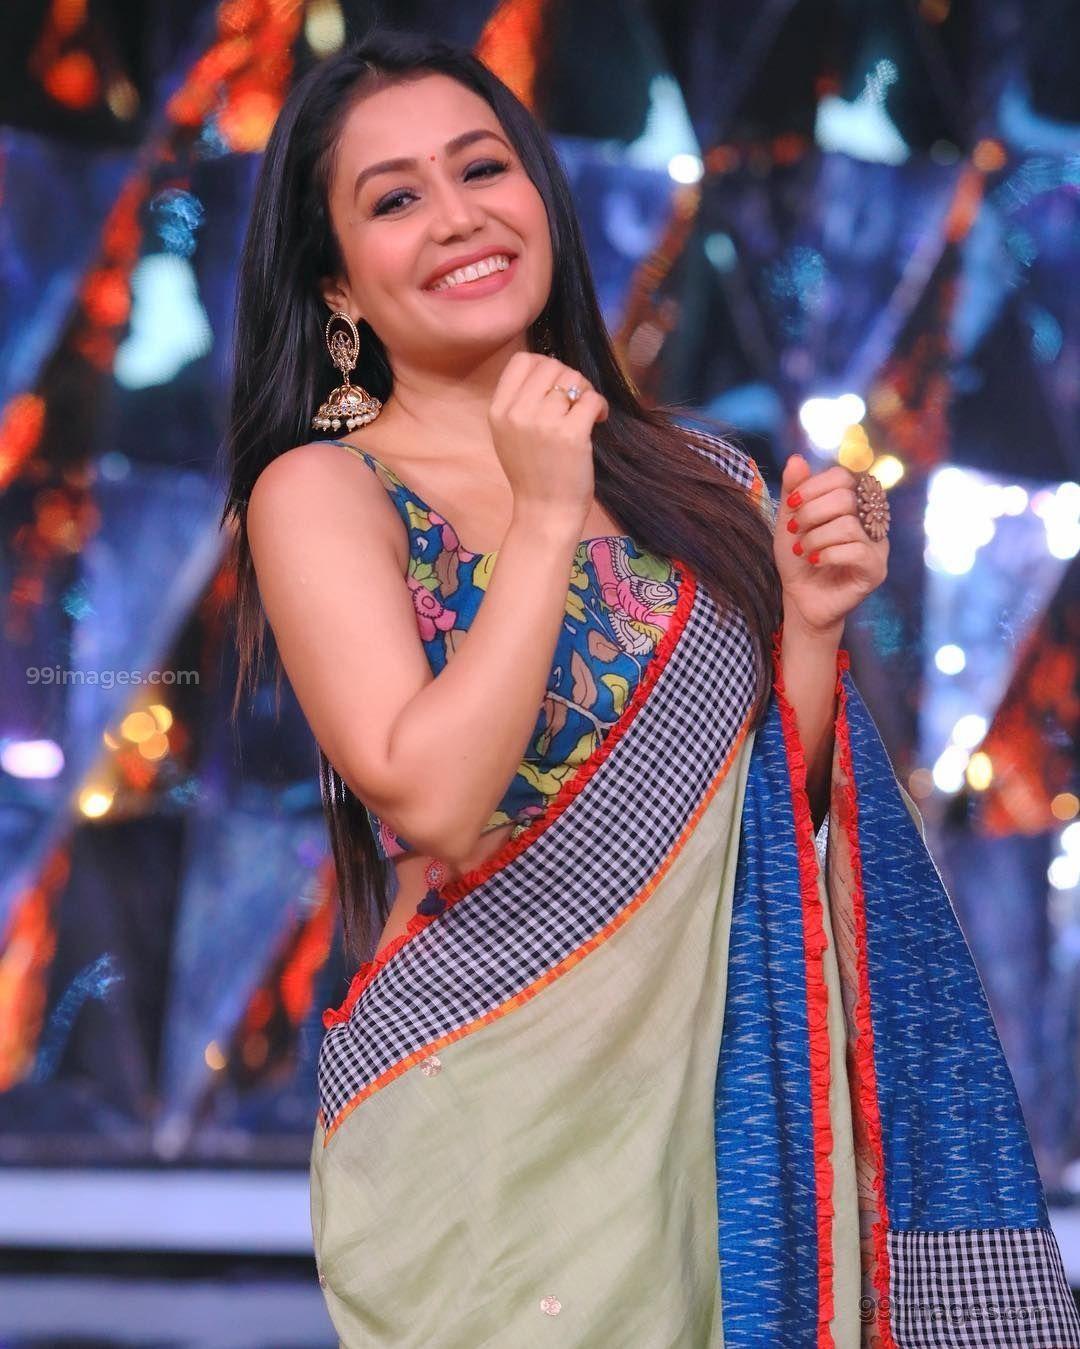 Neha Kakkar Beautiful Photos Mobile Wallpapers Hd Android Iphone 1080p 37826 Nehakakkar Actress Tele Neha Kakkar Dresses Neha Kakkar Stylish Sarees